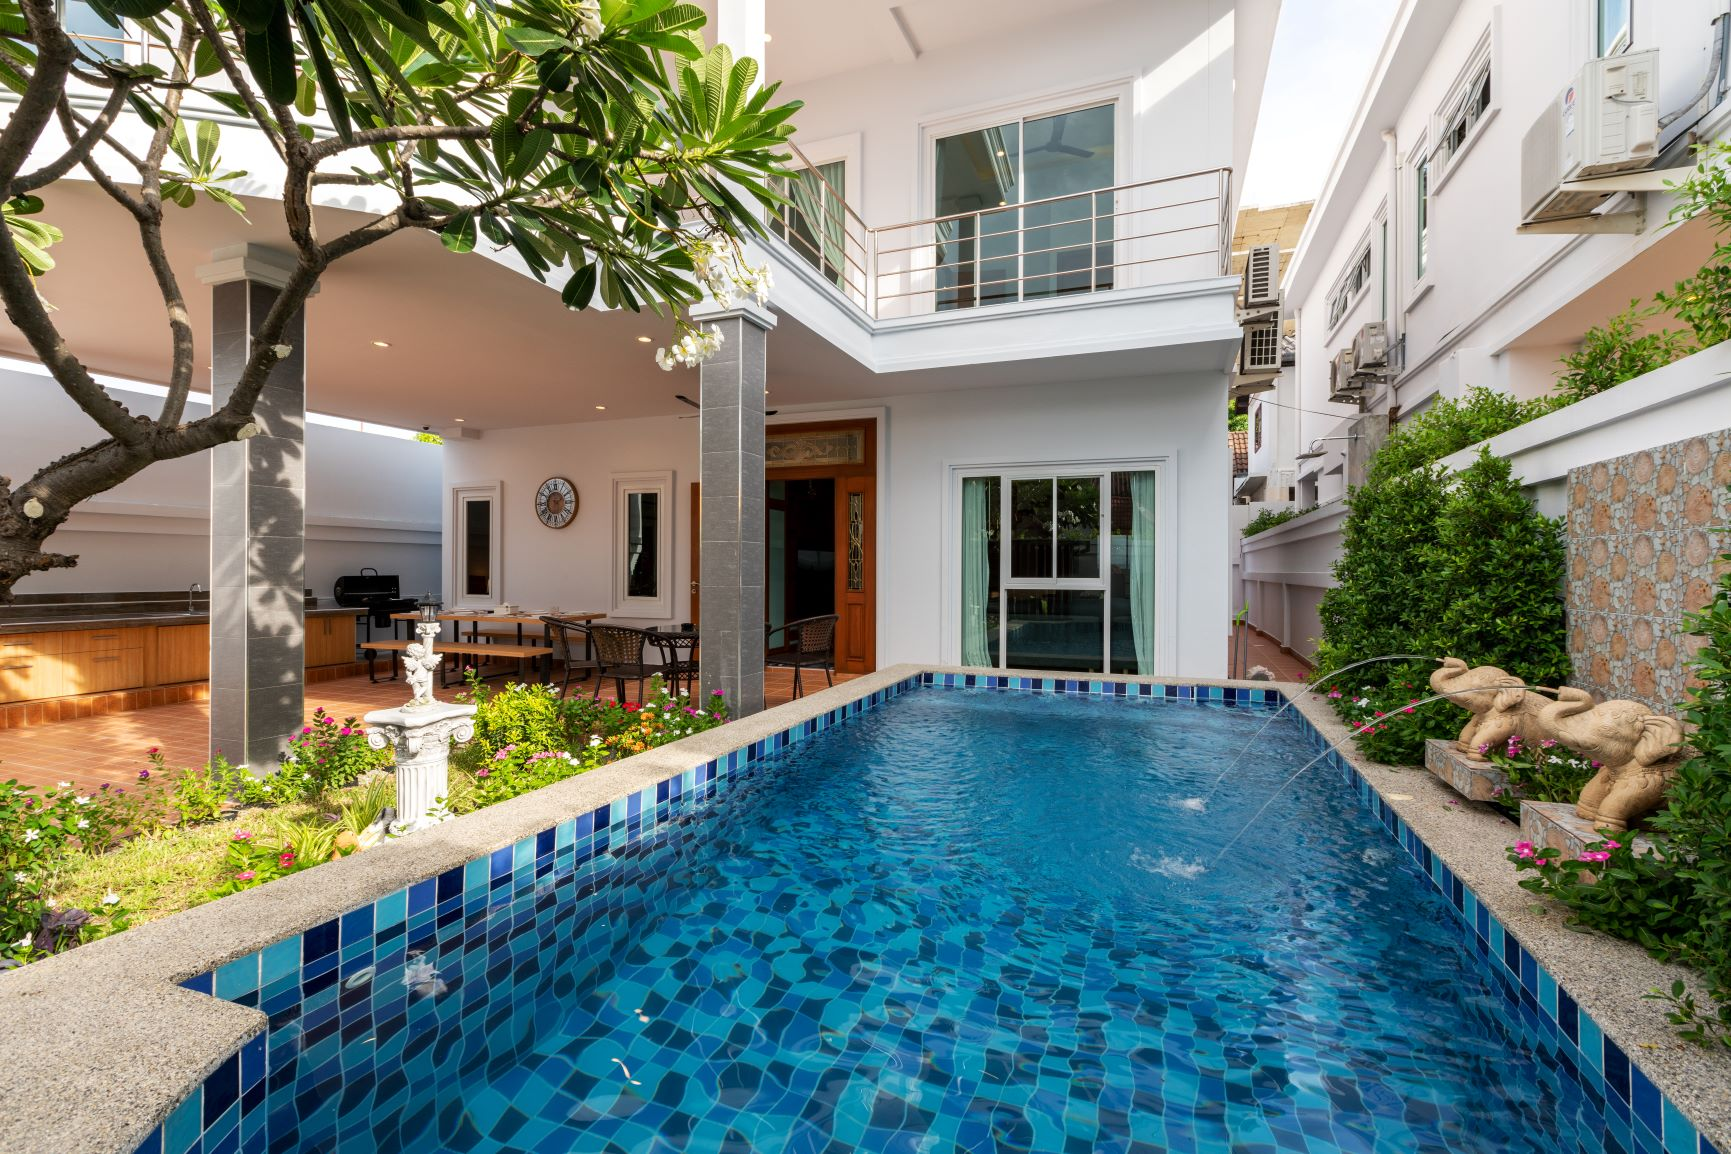 388/22 Suksabai Villa - 12 Million Baht  2 Stories house with private swimming pool, 5 Bedrooms, 5.5 Bathrooms, Living room, European kitchen, Storage room